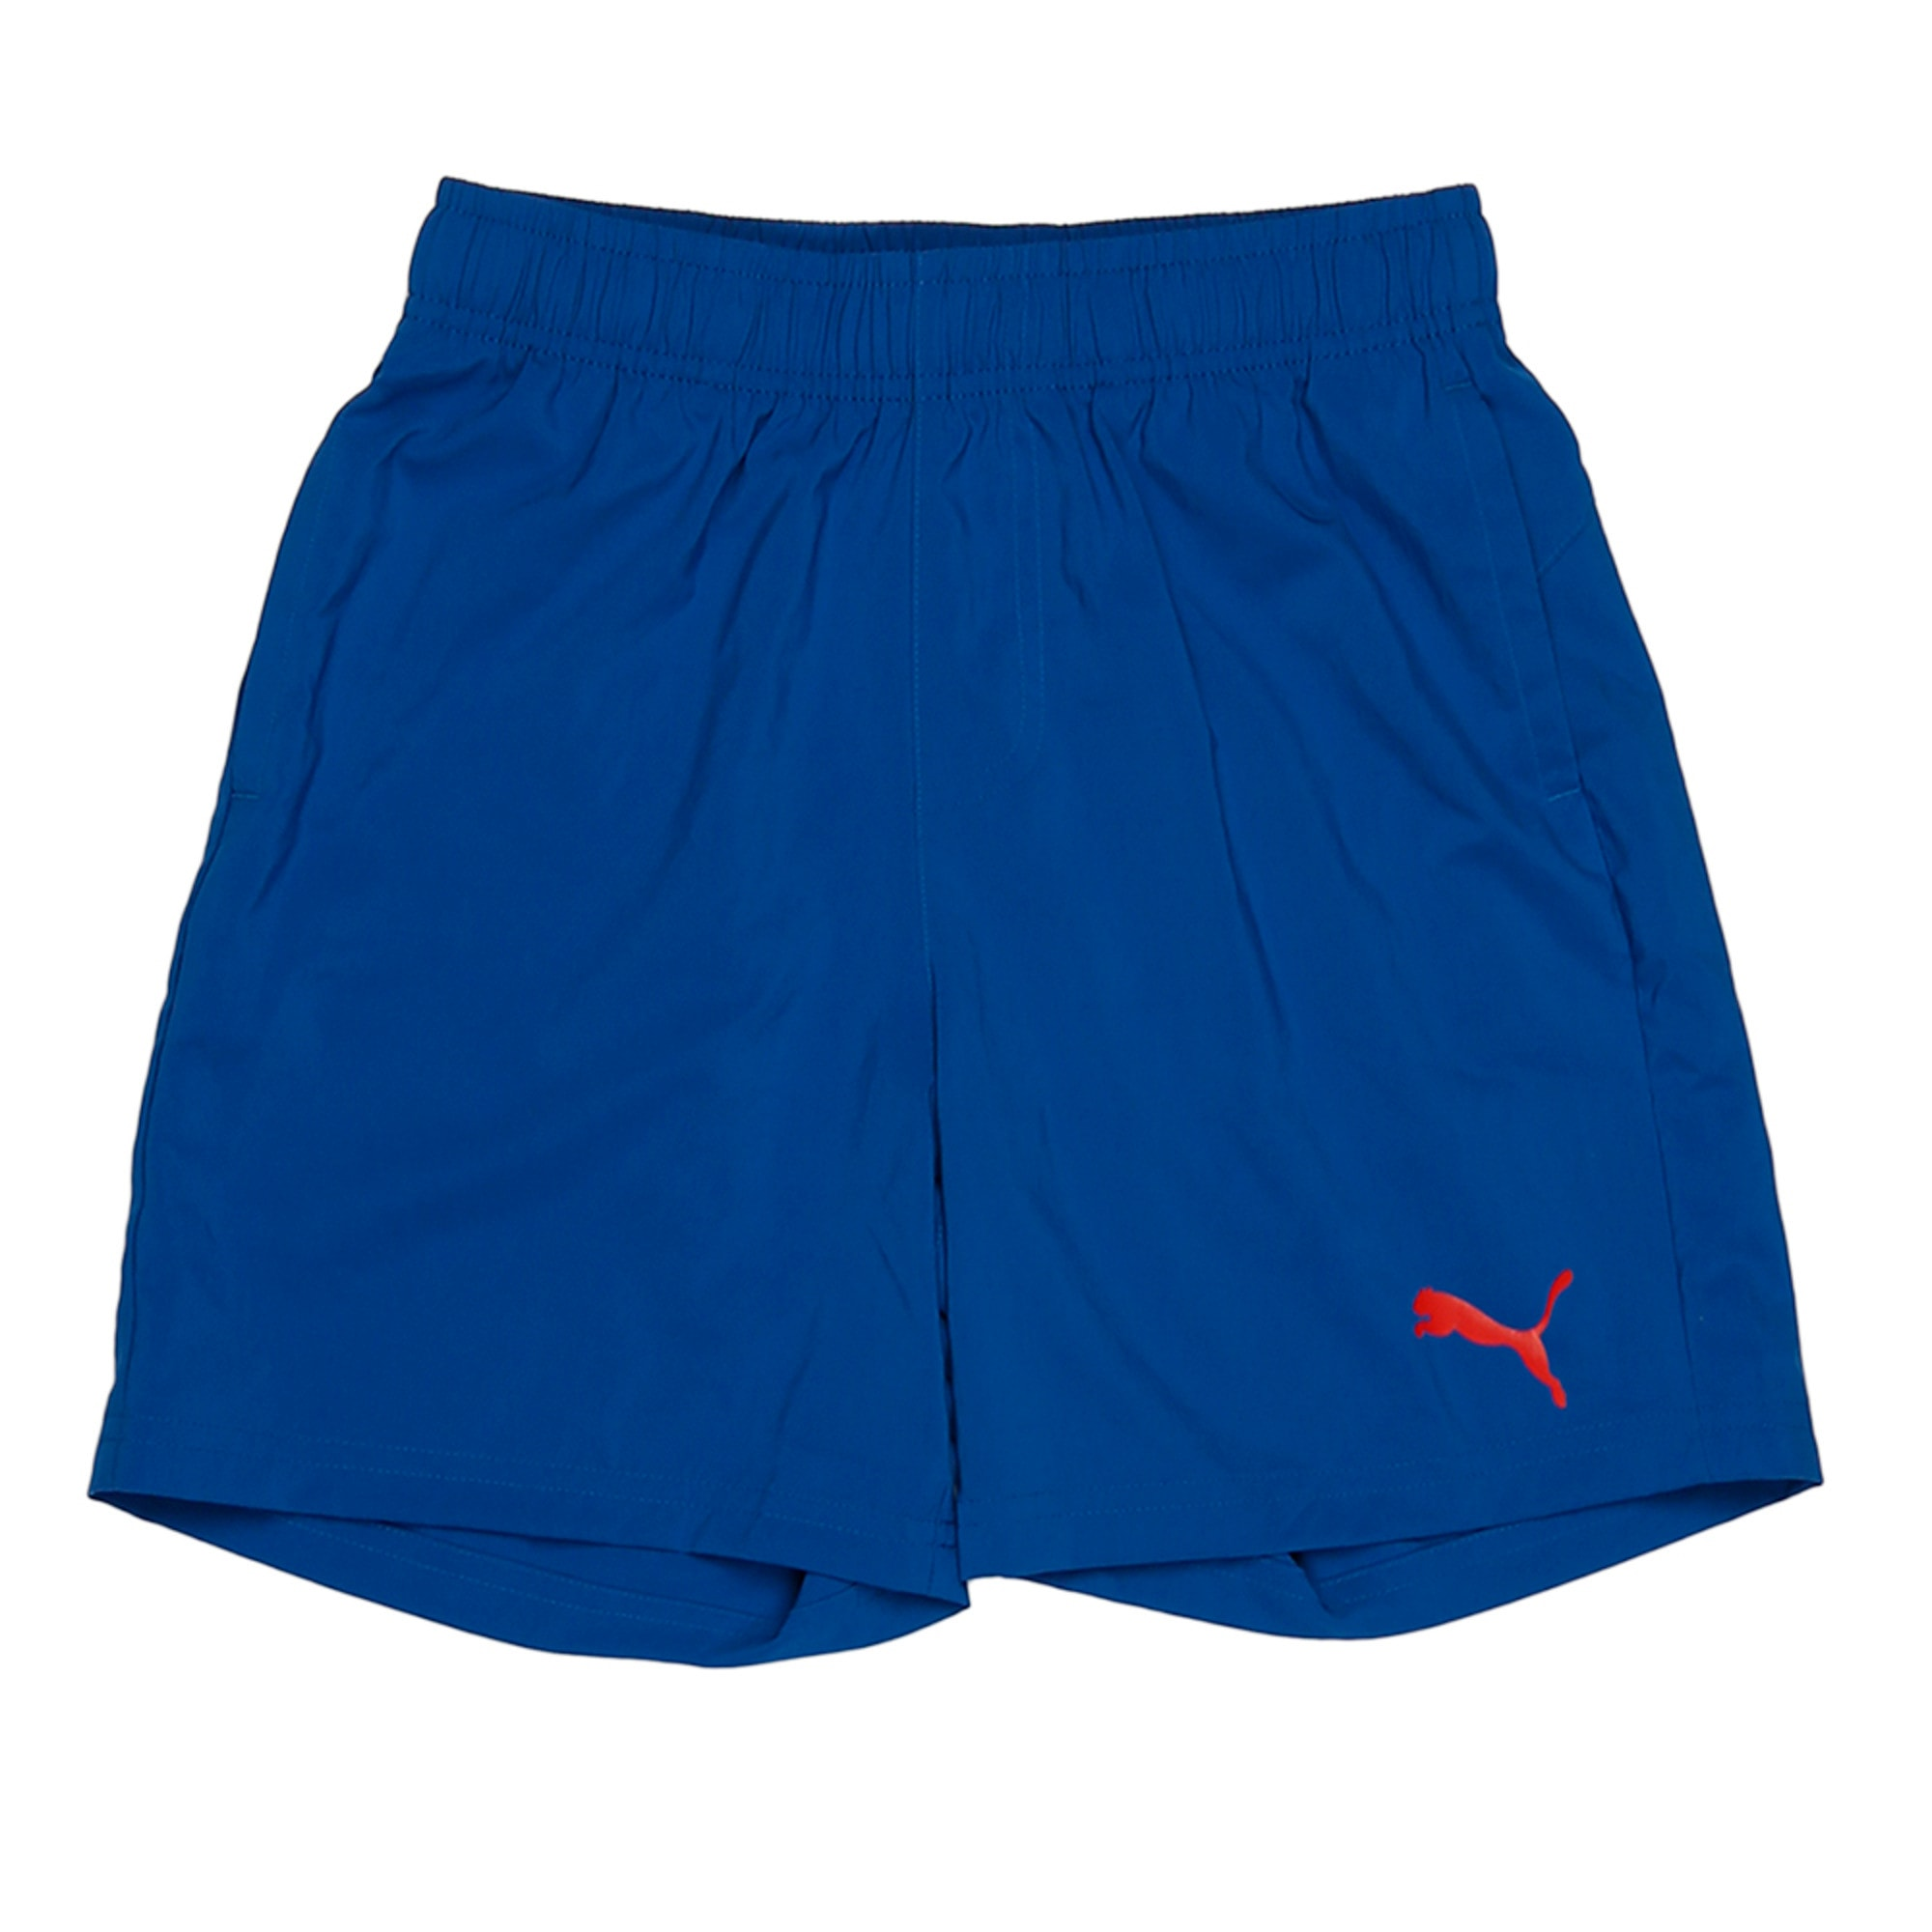 "Thumbnail 2 of ESS Woven Shorts 5"", TRUE BLUE, medium-IND"